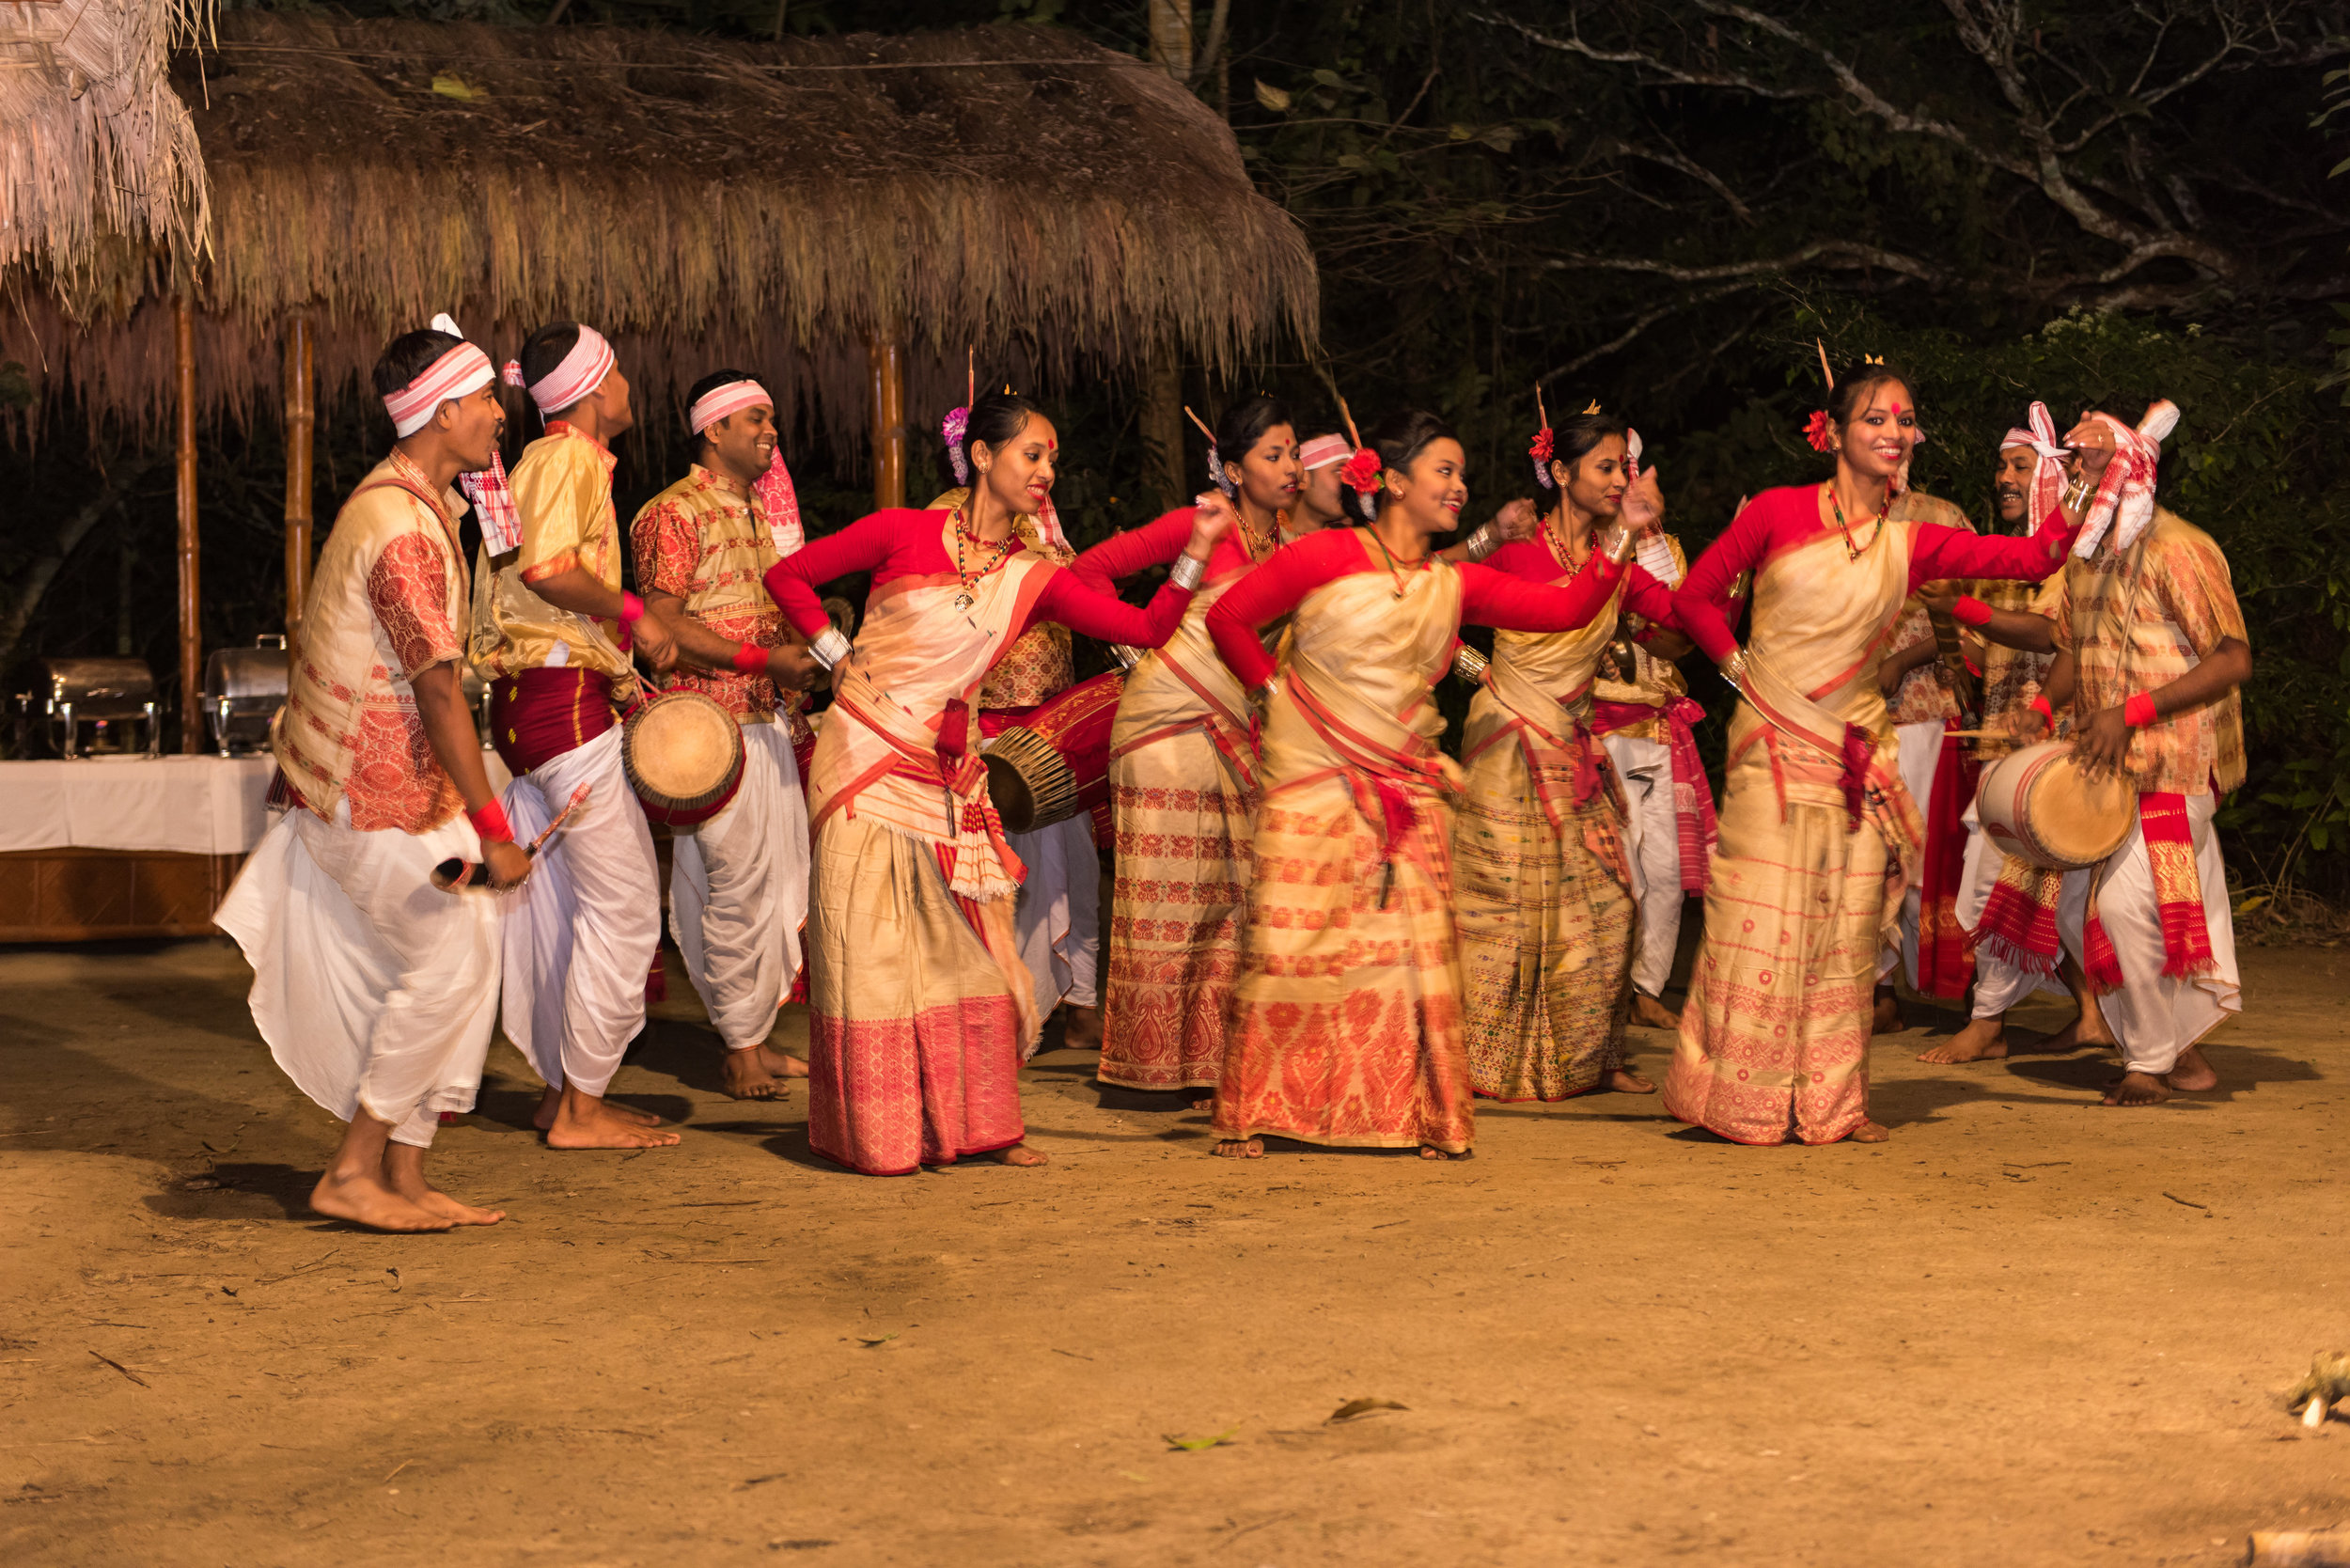 Assamese dancers performing the Bihu